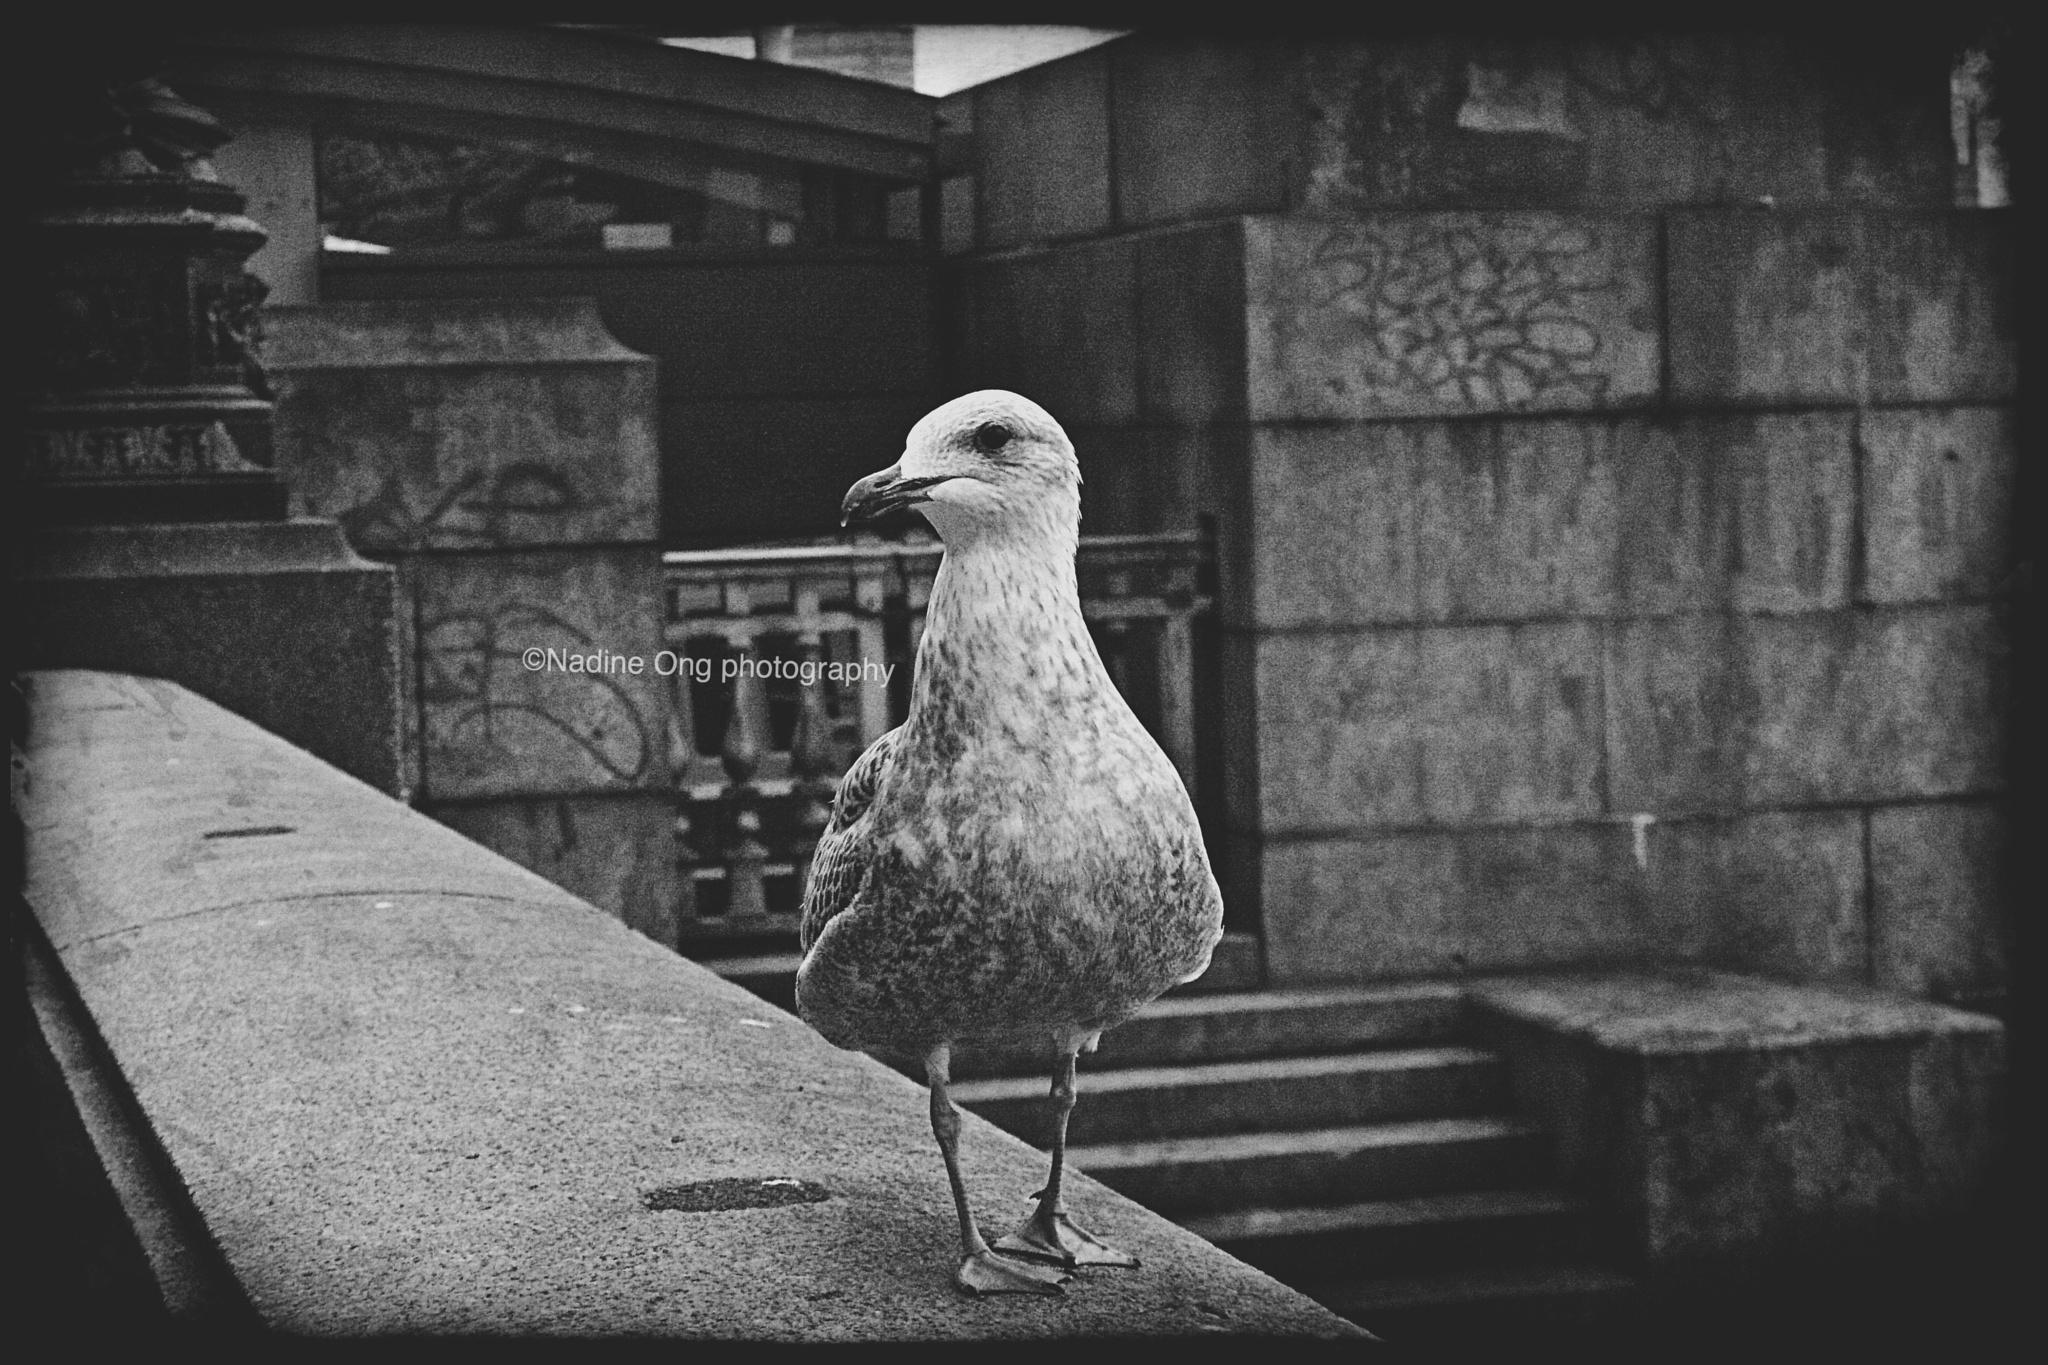 Pigeon visting Big Ben - 2015 by Nadine Ong